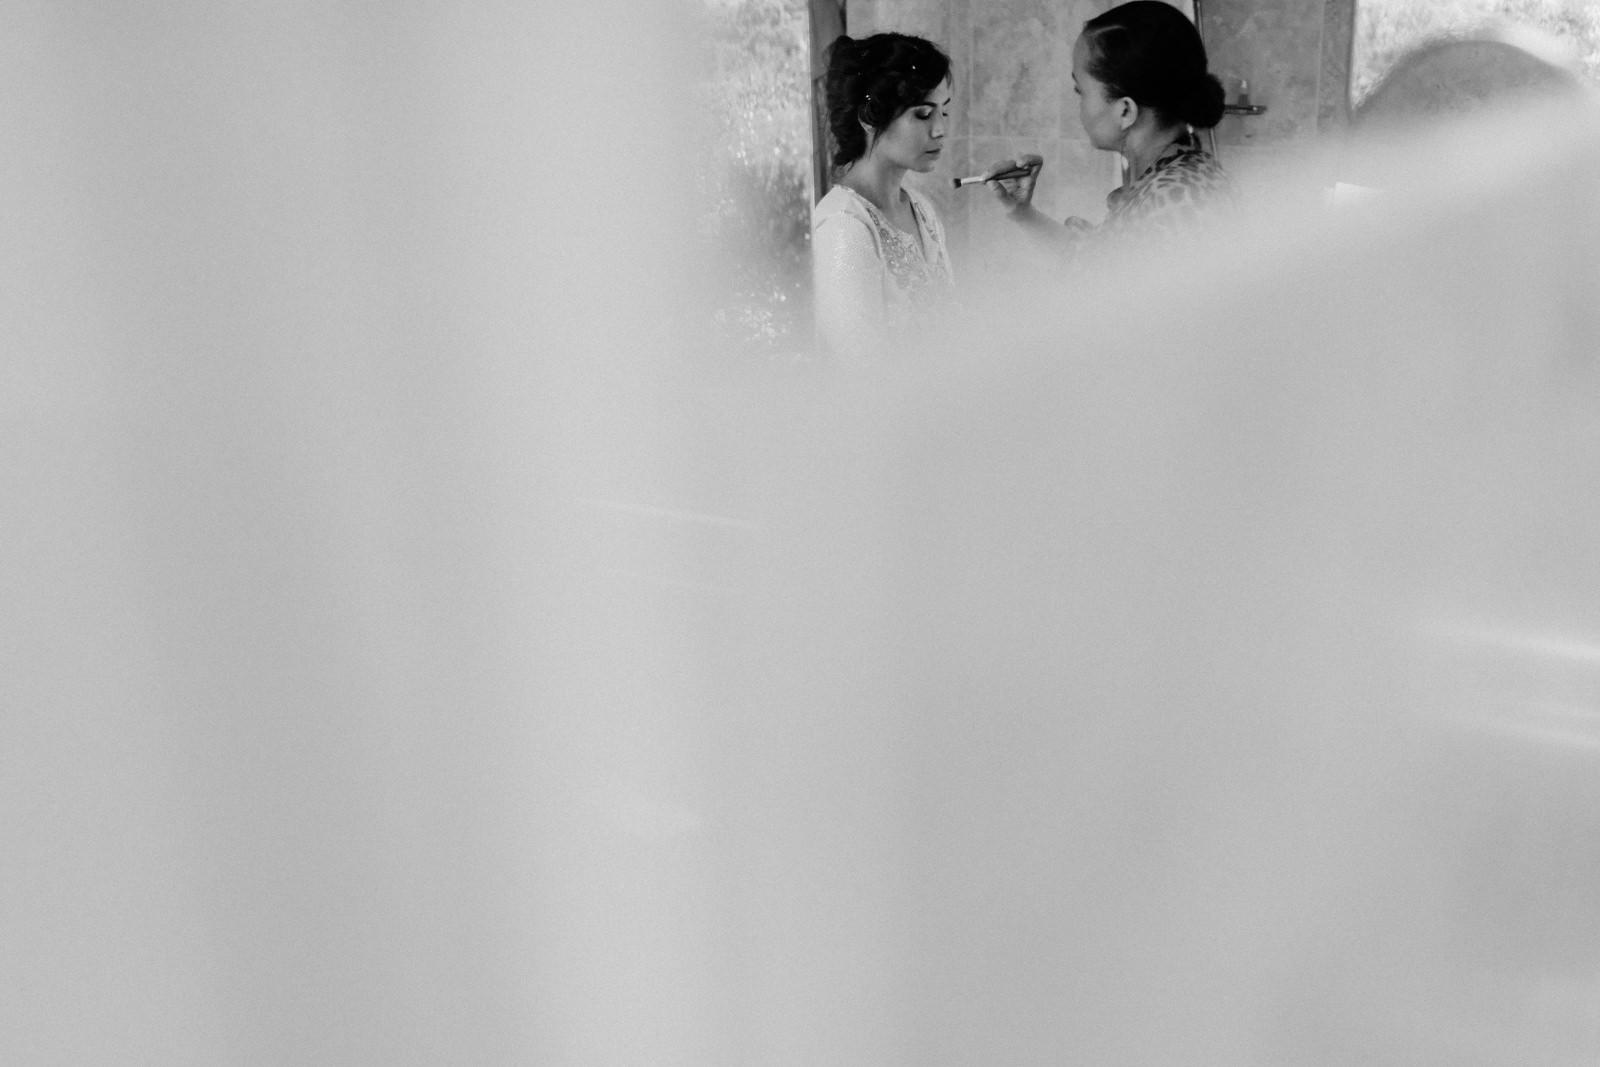 Bruno+Carly-FitNBlog-PaulSimon-00043.jpg